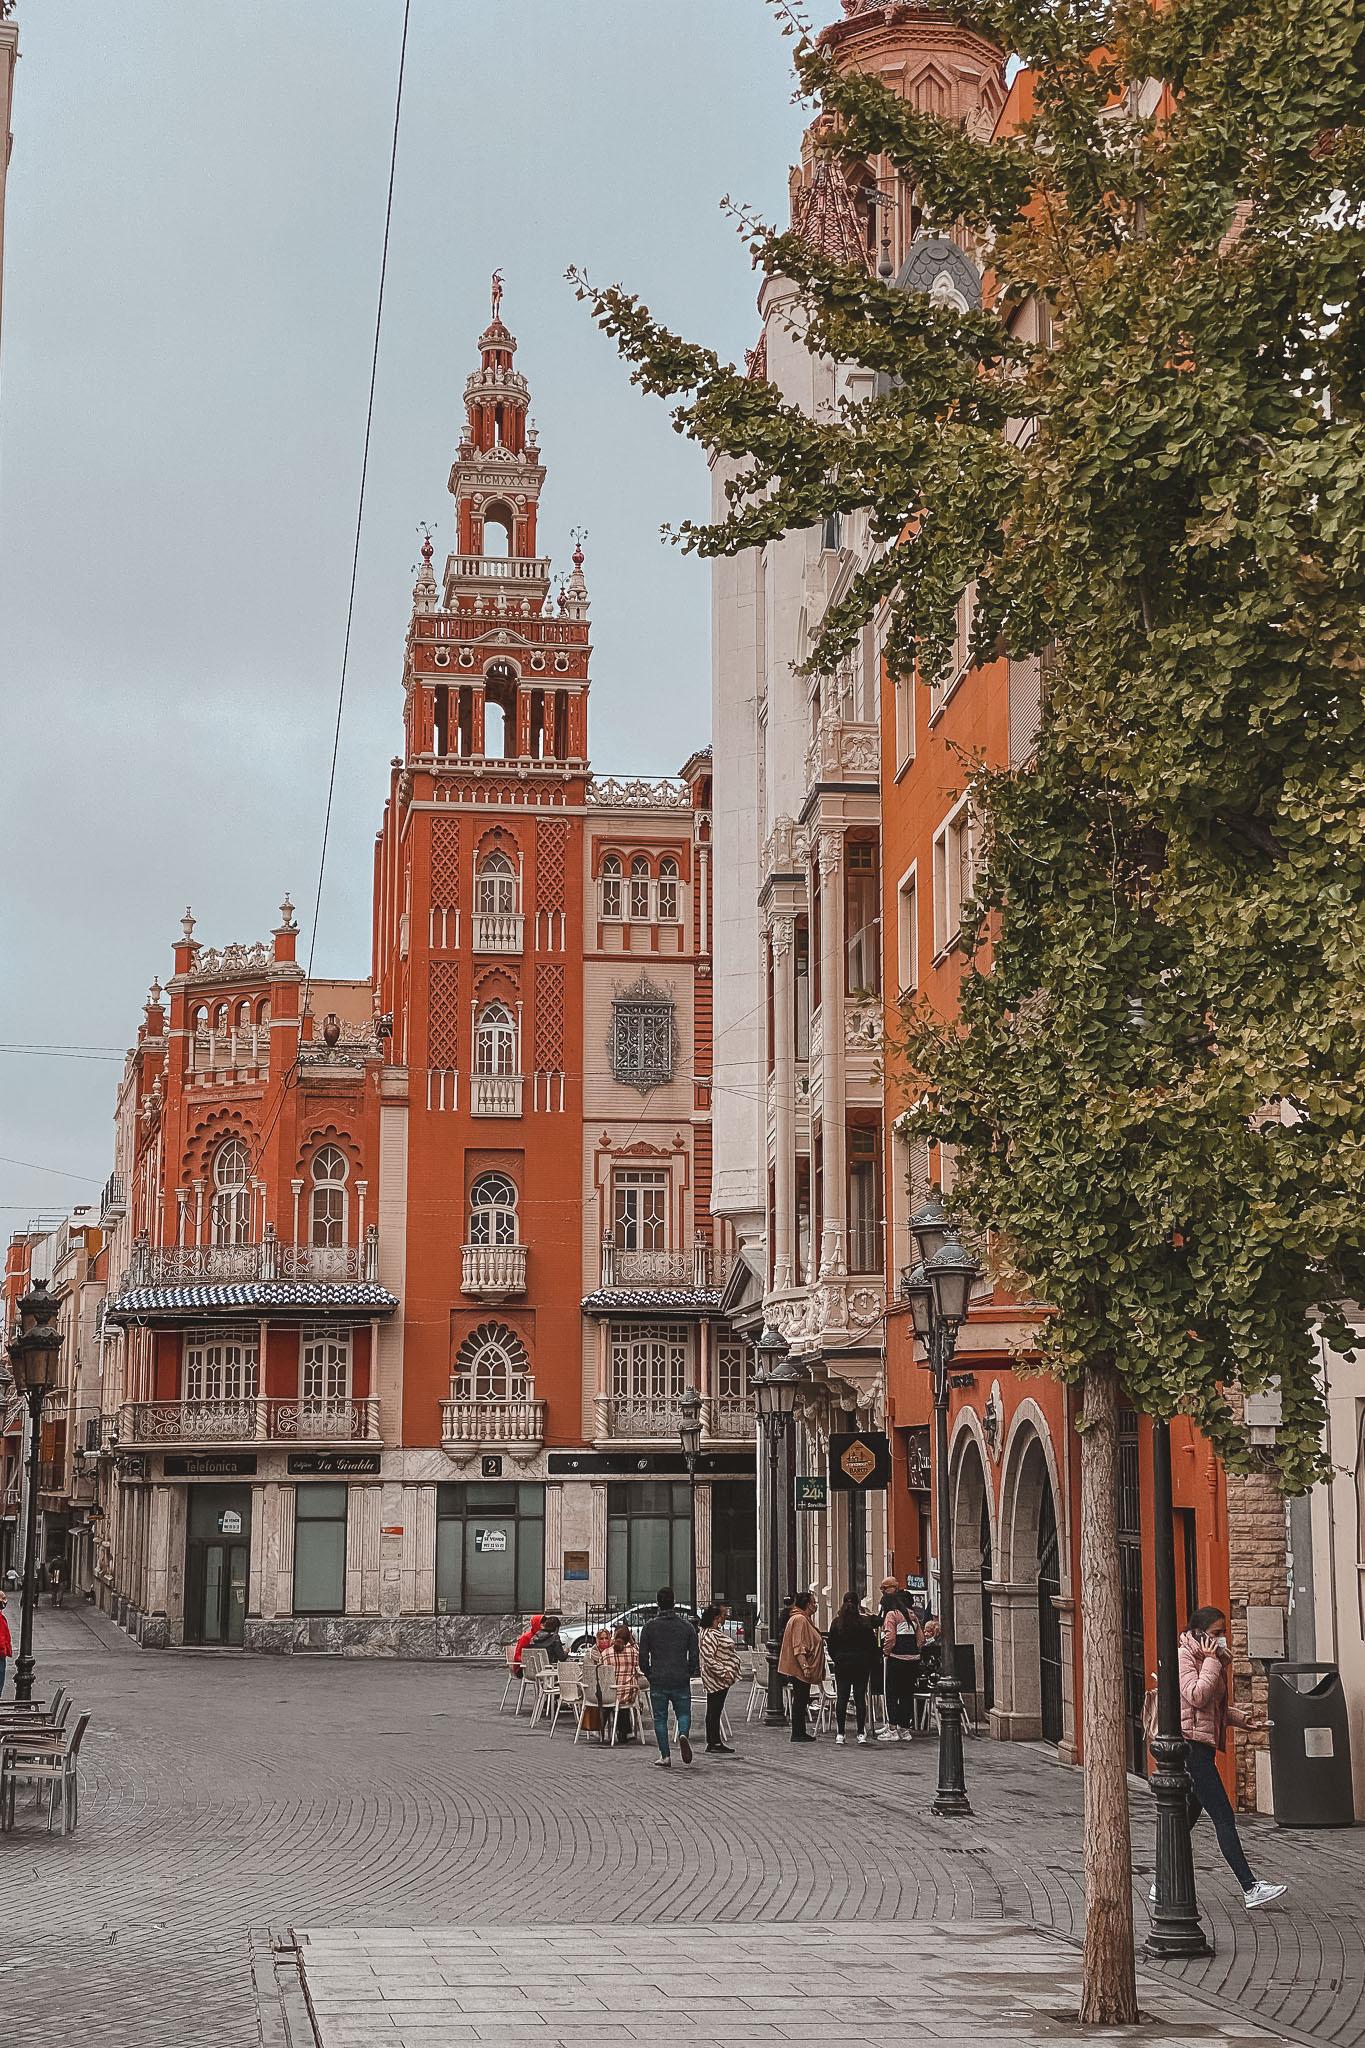 Que ver Badajoz. Plaza Soledad Giralda